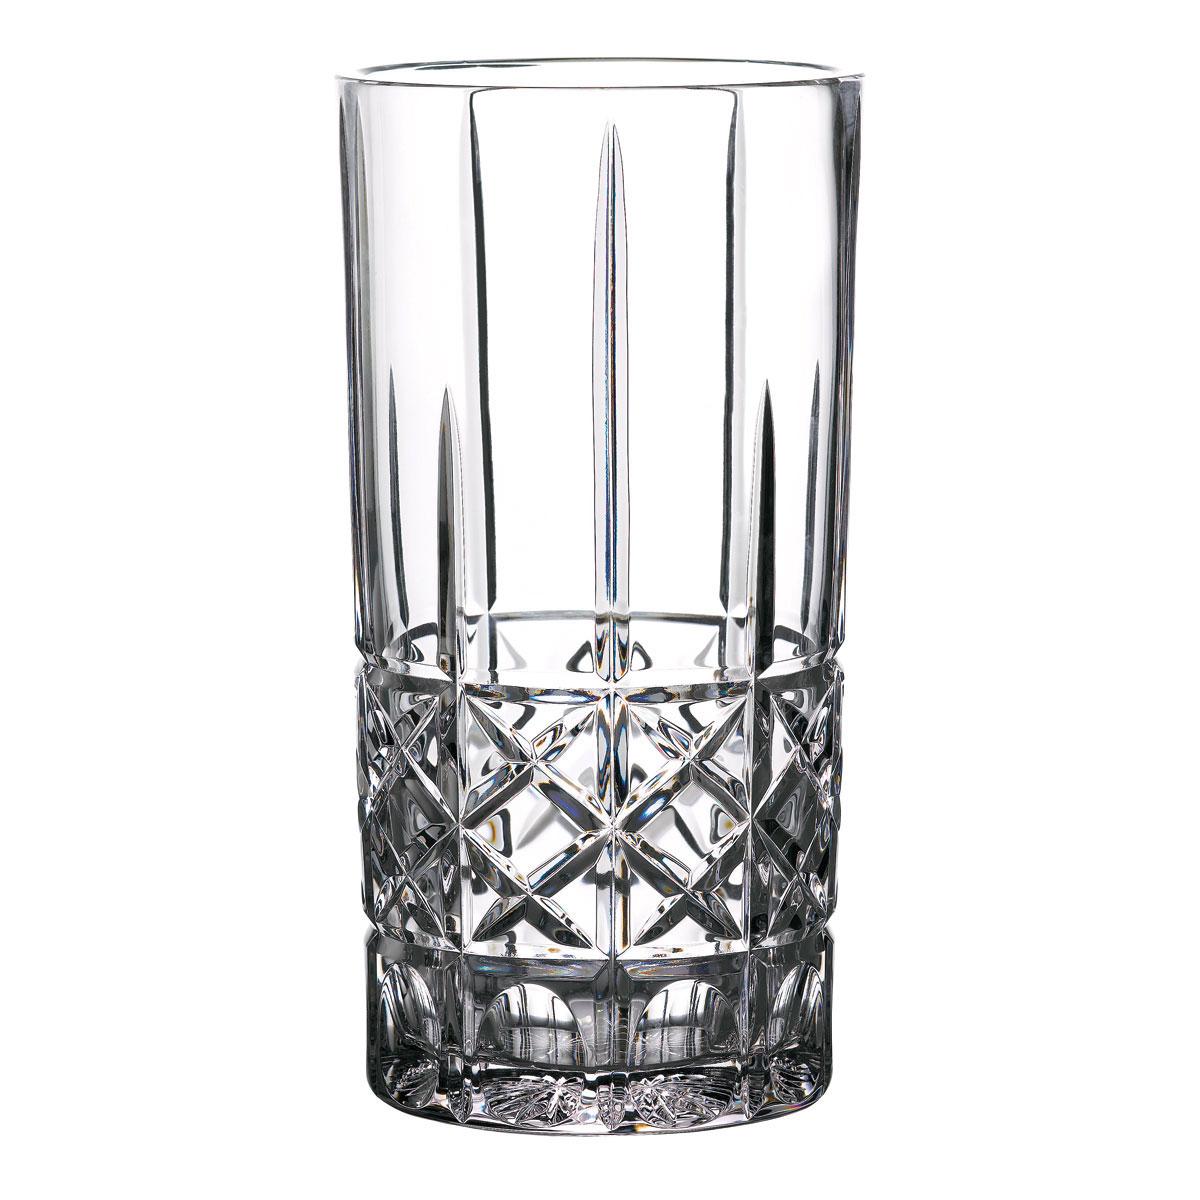 "Marquis by Waterford Brady 9"" Crystal Vase"